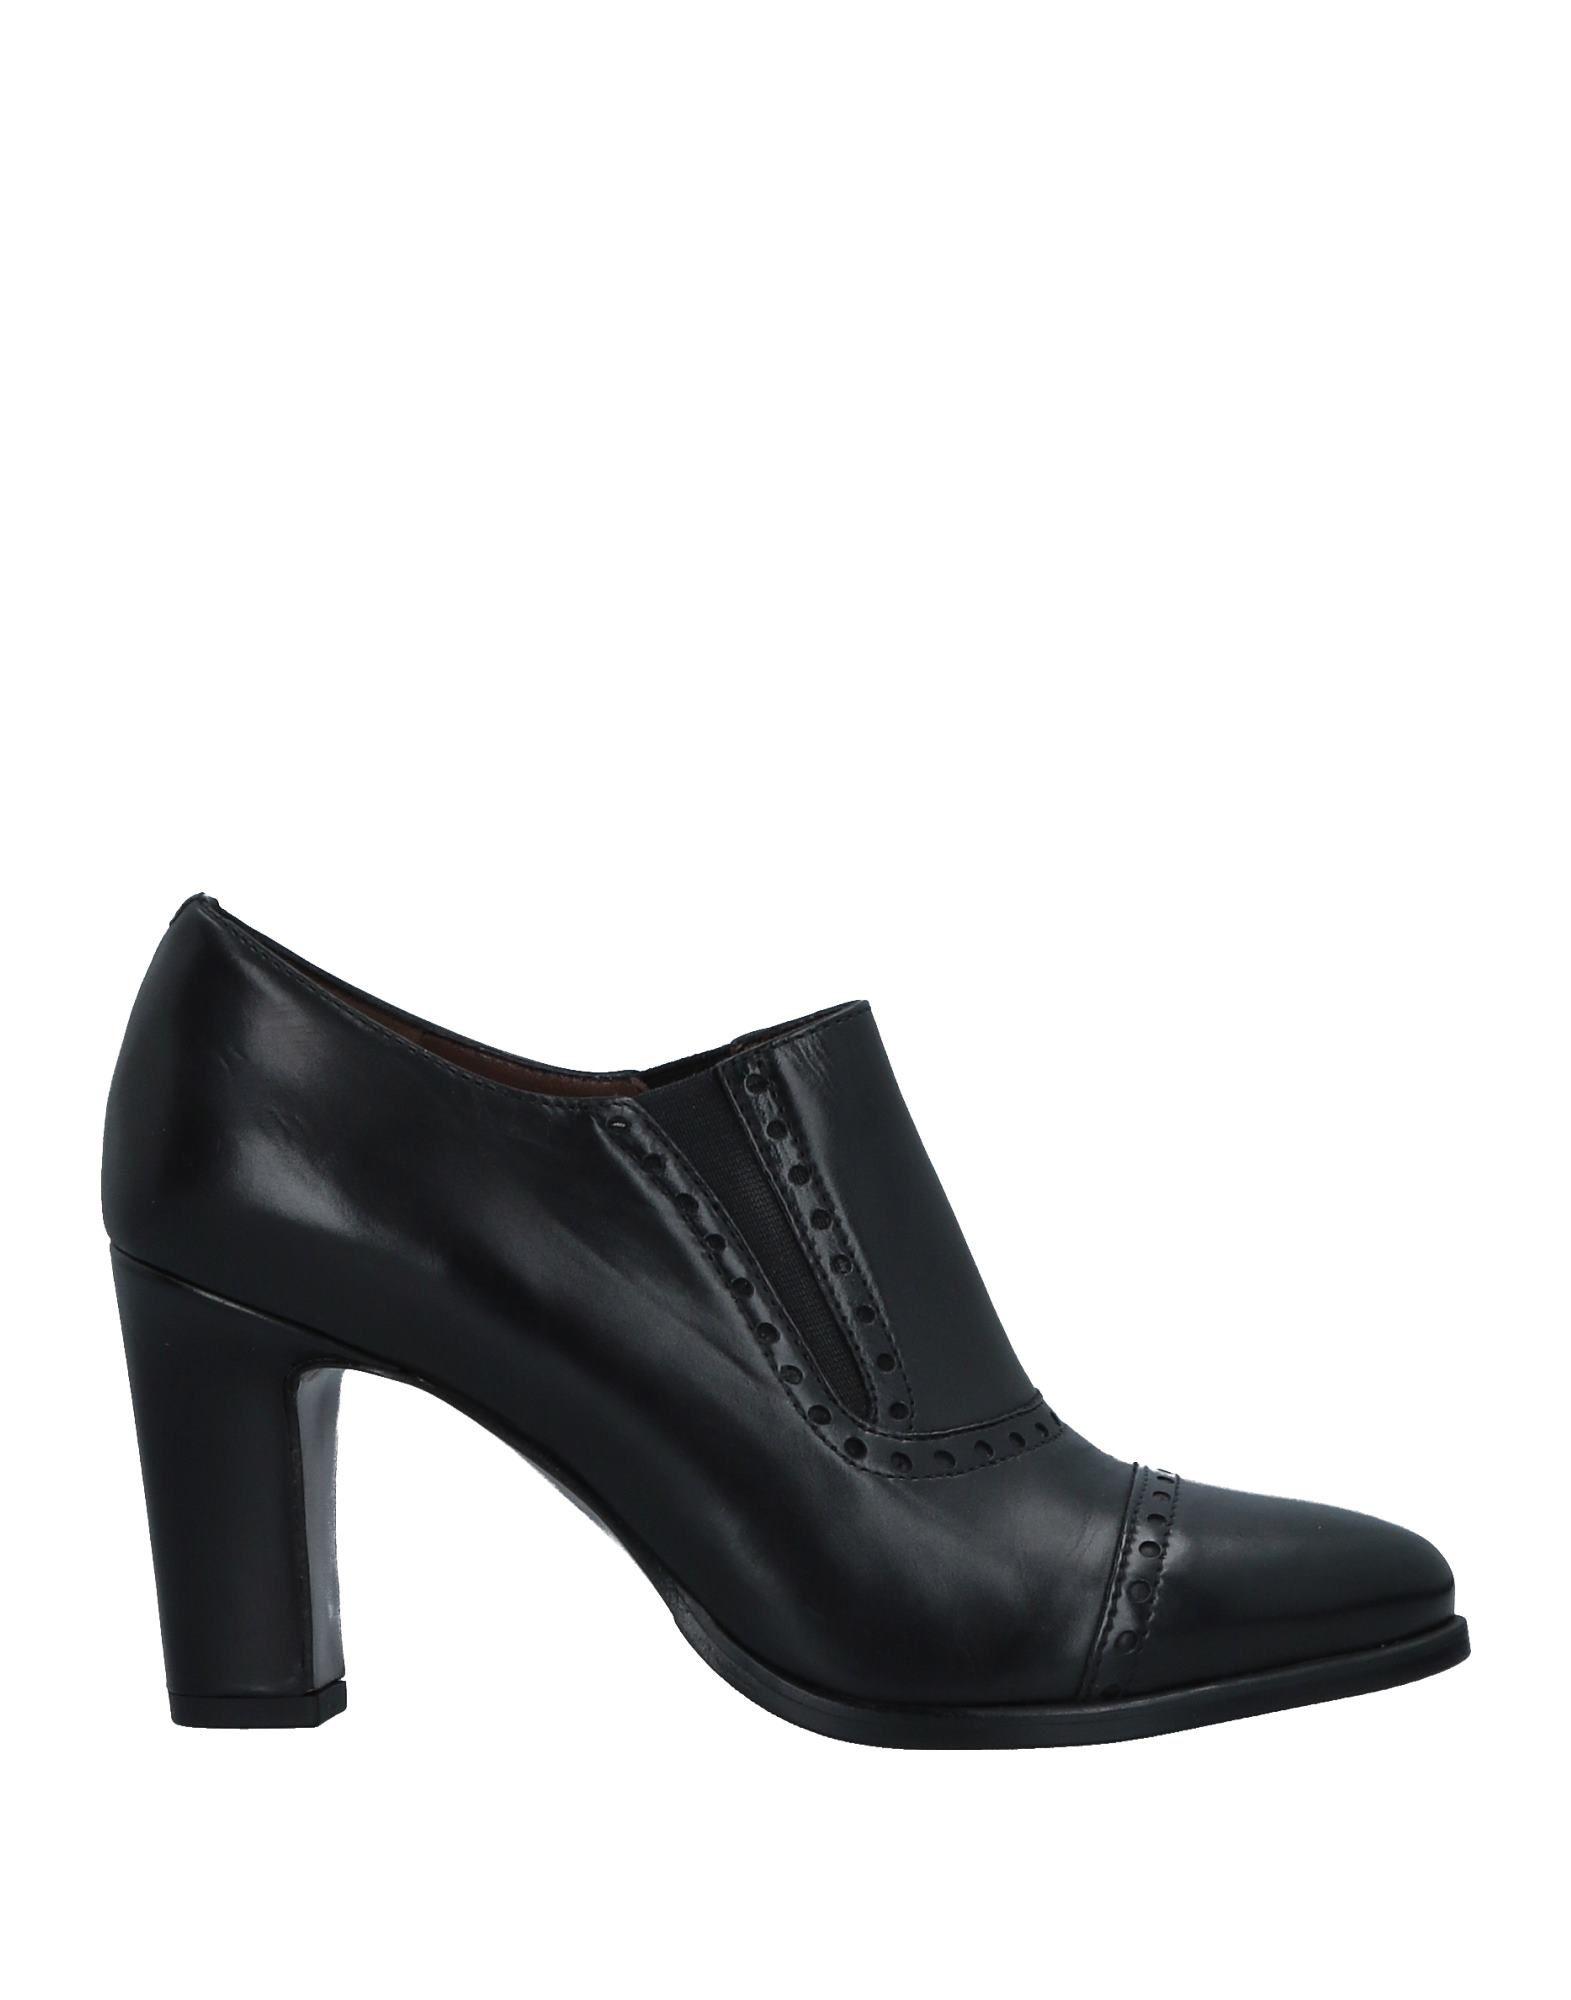 Zanfrini Cantù Stiefelette Damen  11516883MJ Gute Qualität beliebte Schuhe